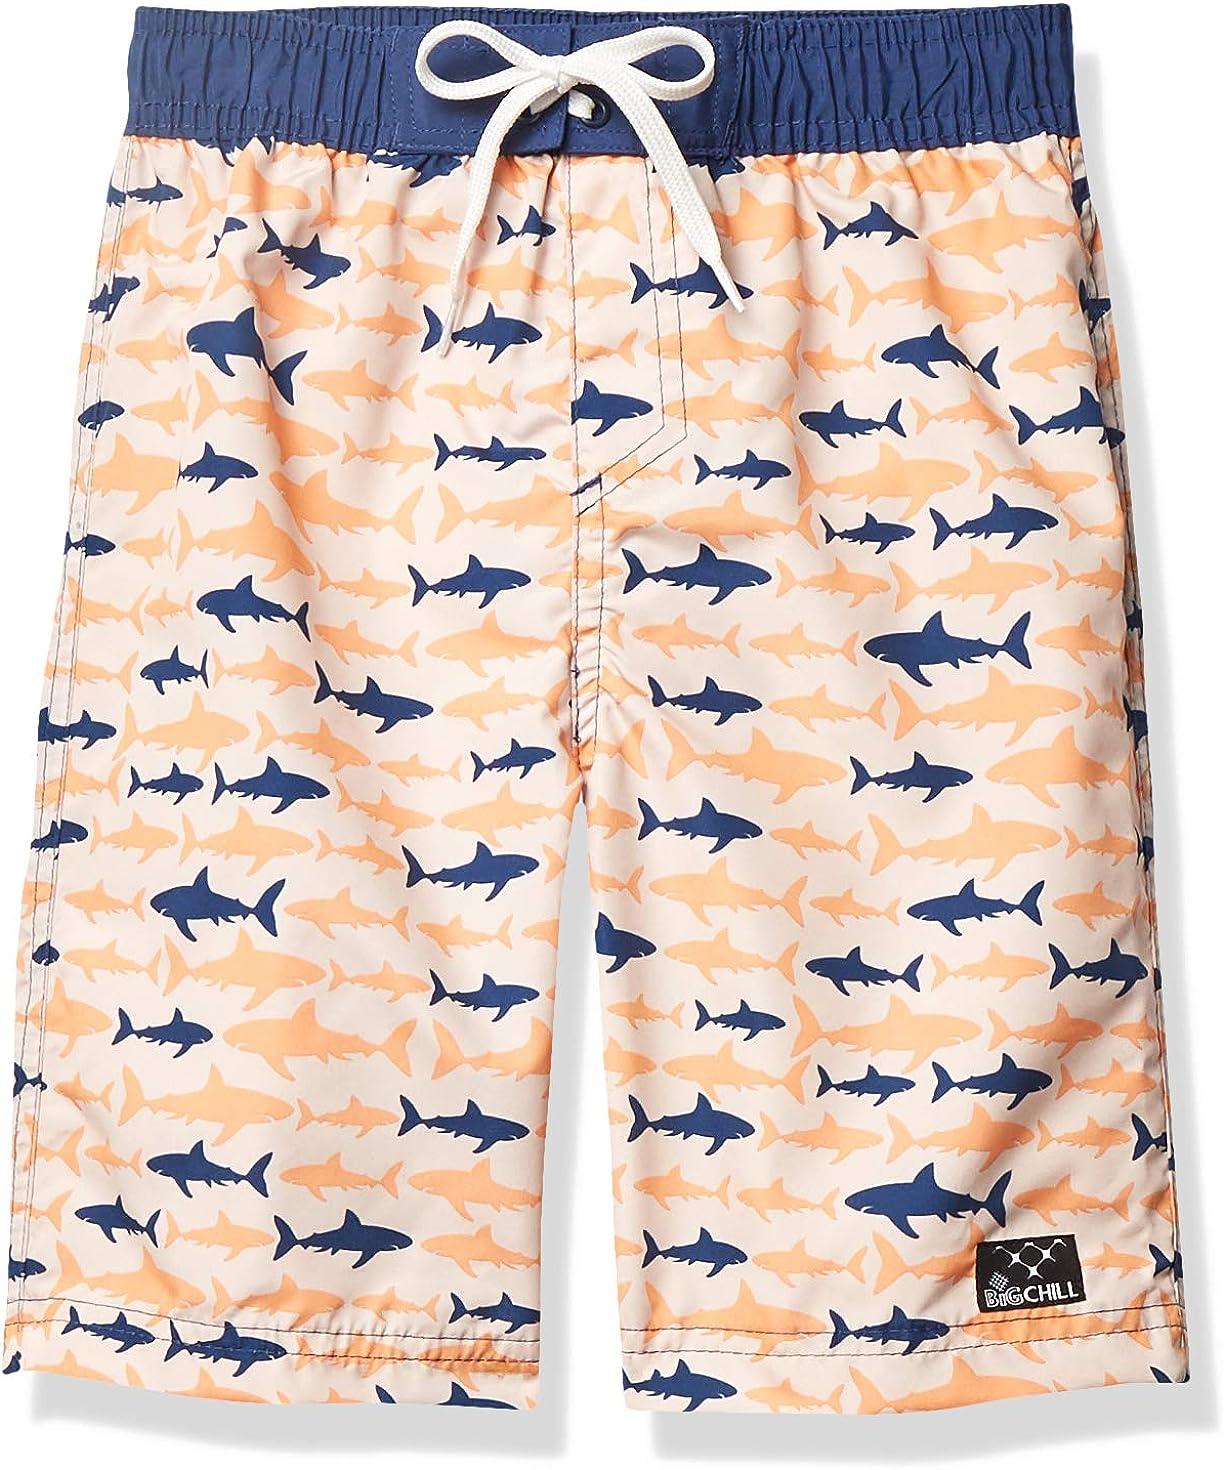 Big Chill Boys Big Printed Swim Trunks